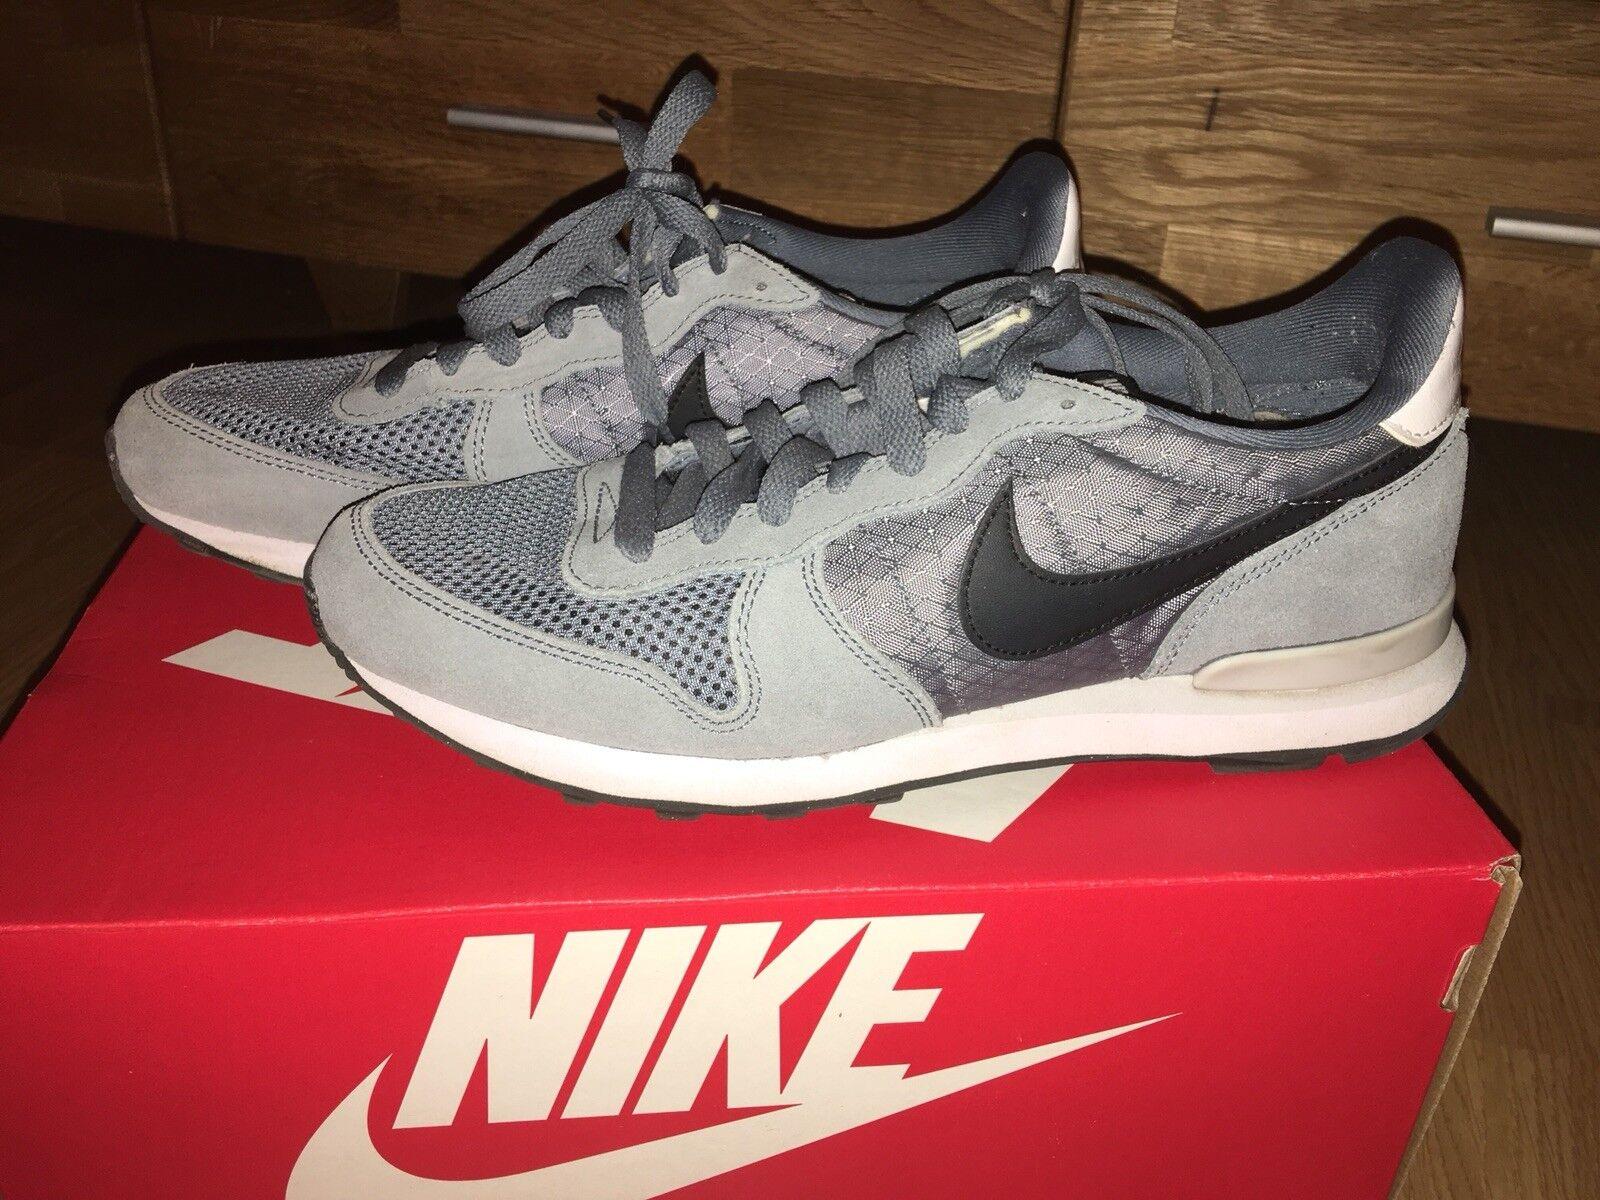 Nike Internationalist Turnschuhe Schuhe UK 6,5 Blau graphit schwarz